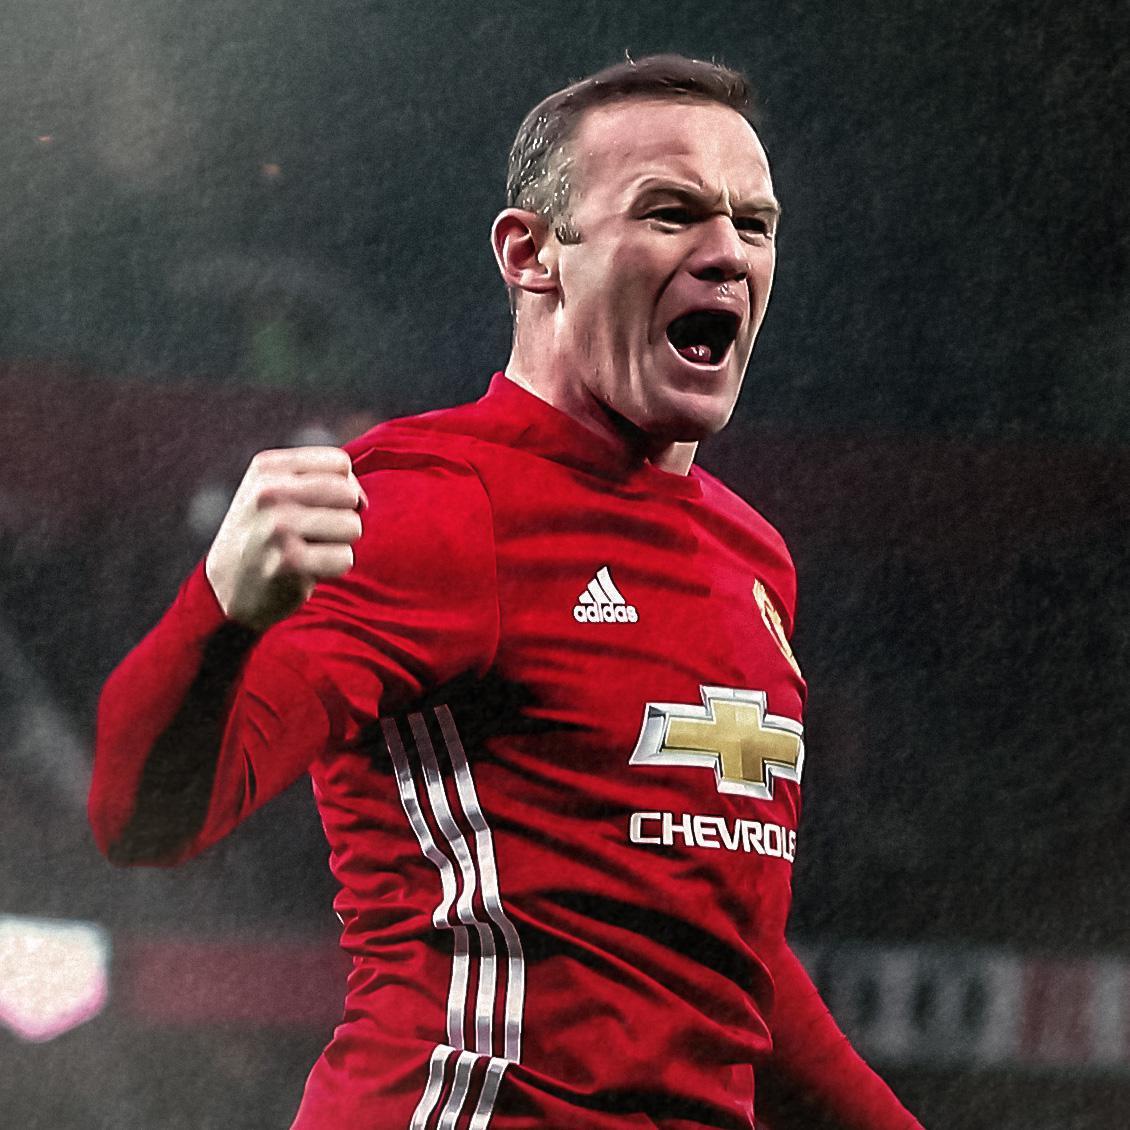 Legends-Profile_Wayne-Rooney1523460268000.jpg